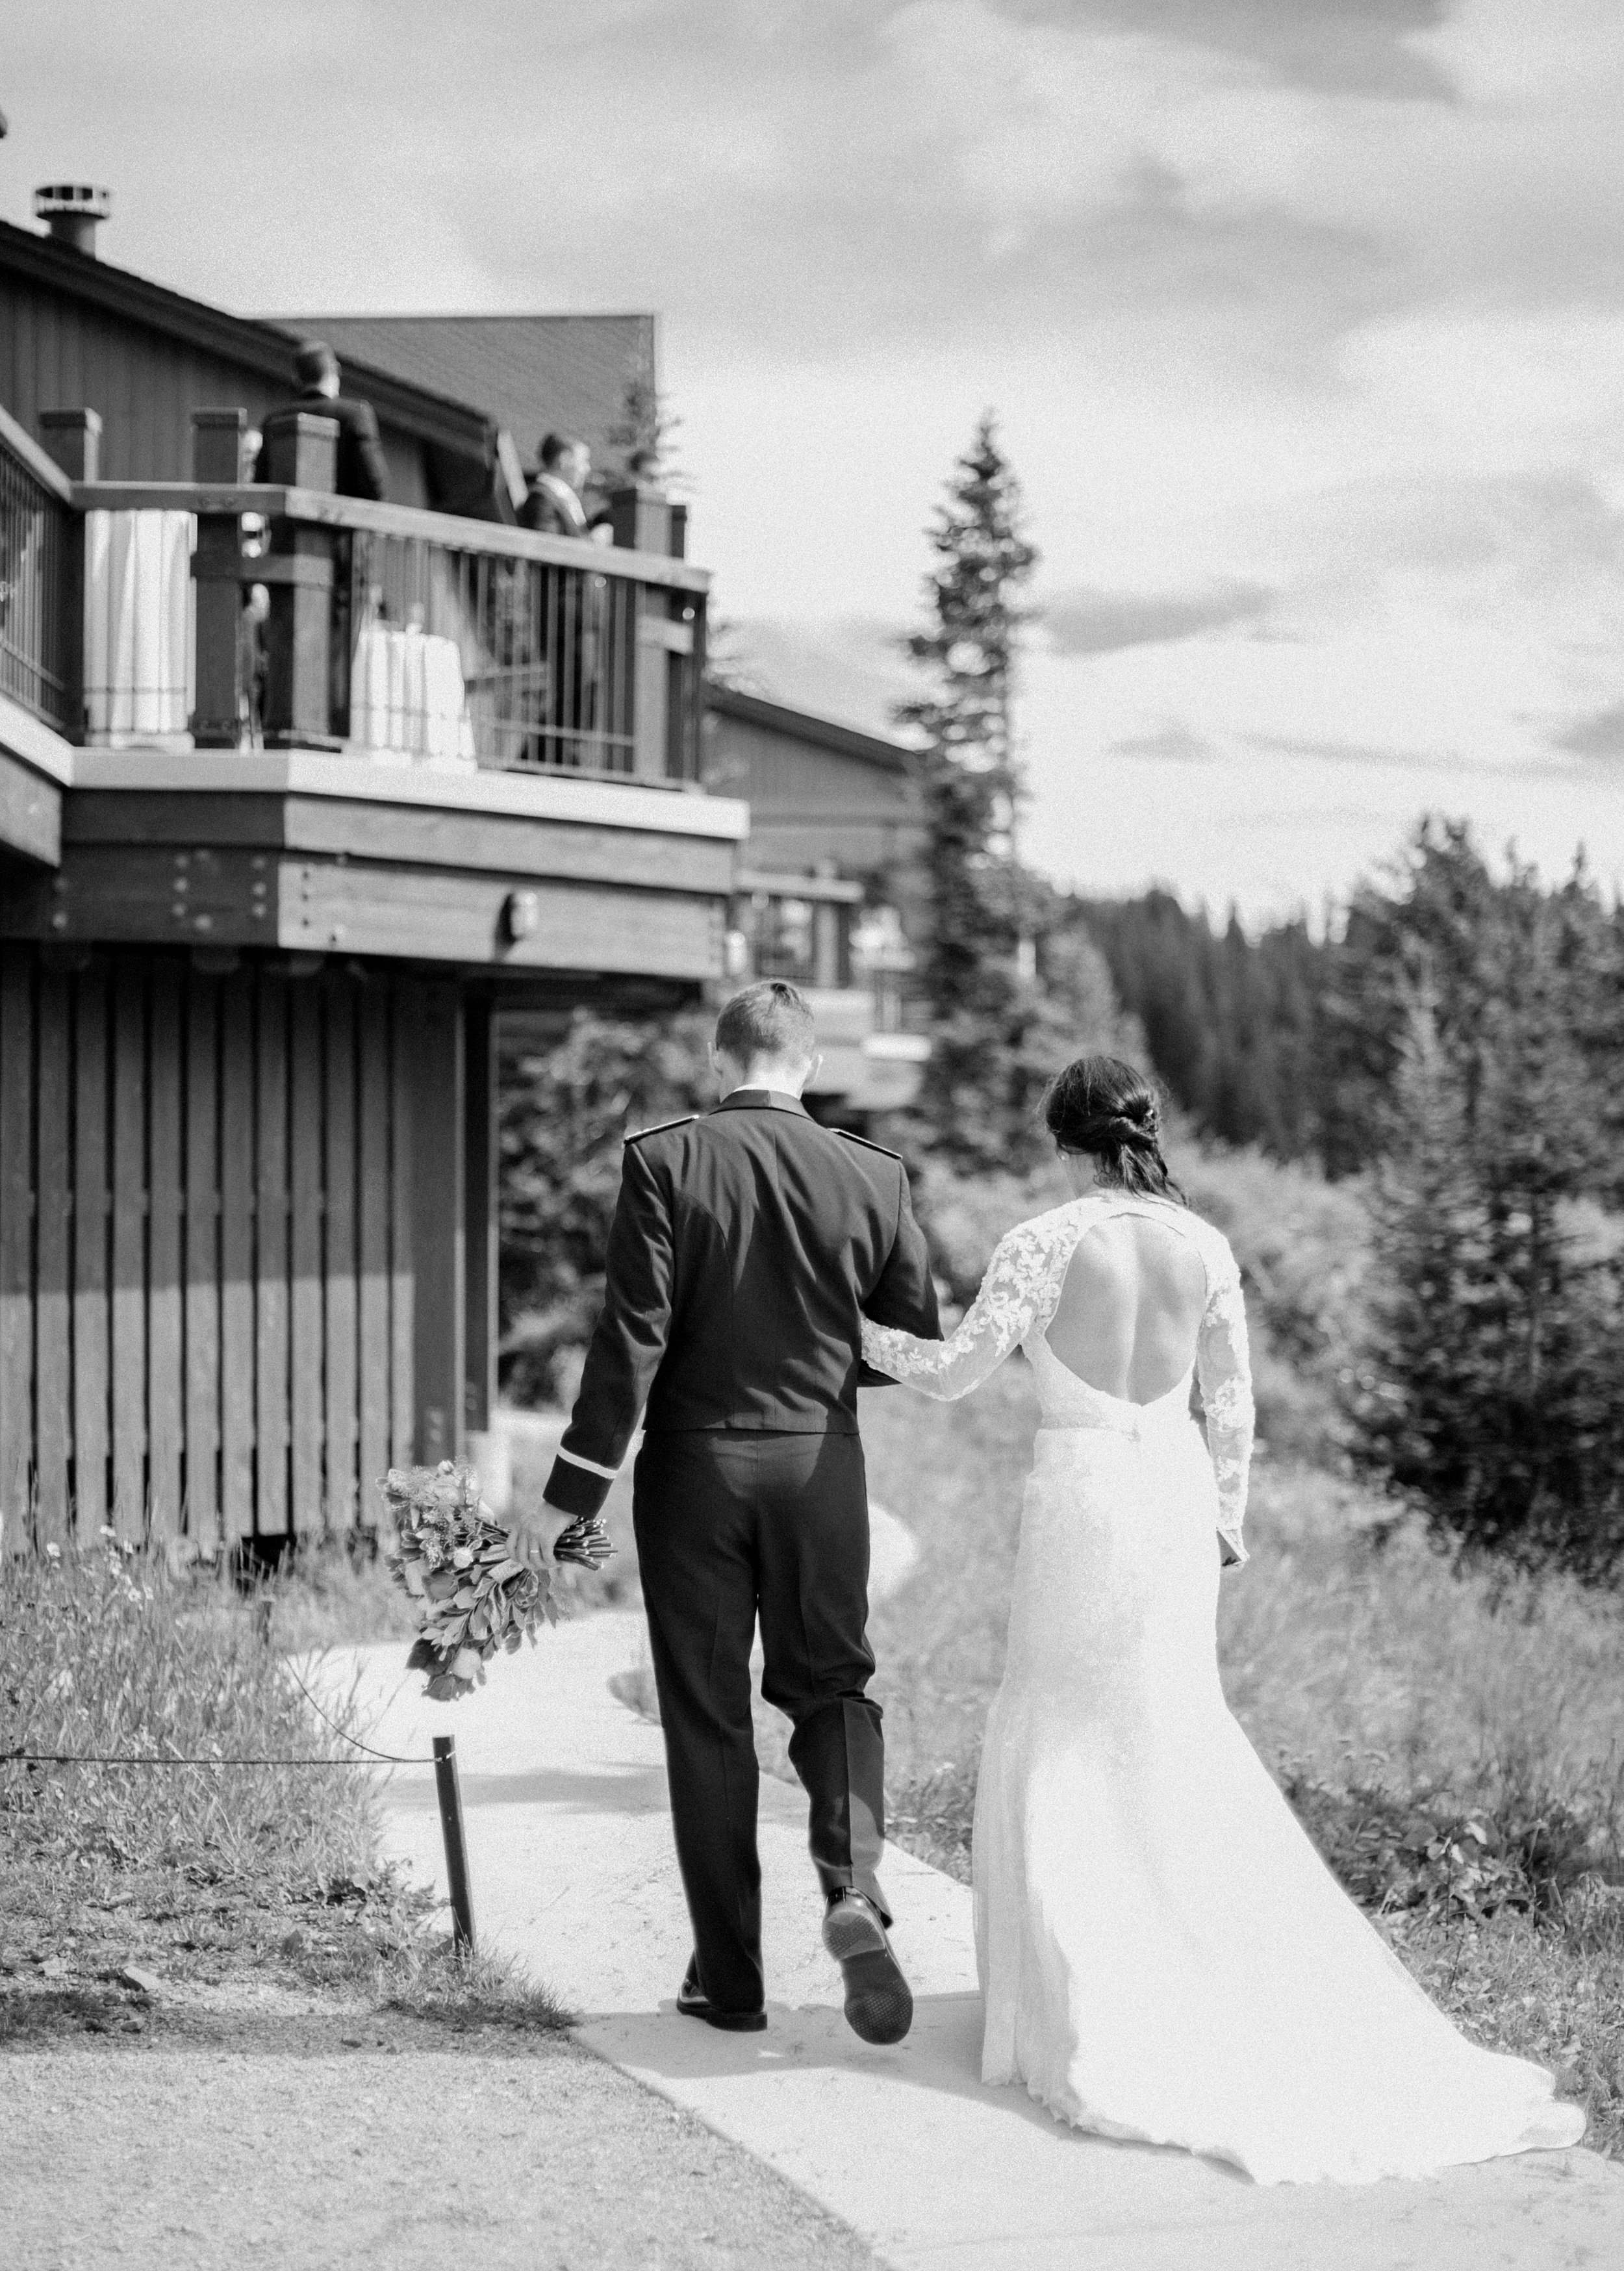 Aspen Colorado Wedding- The Little Nell - Carrie King Photographer-010.jpg